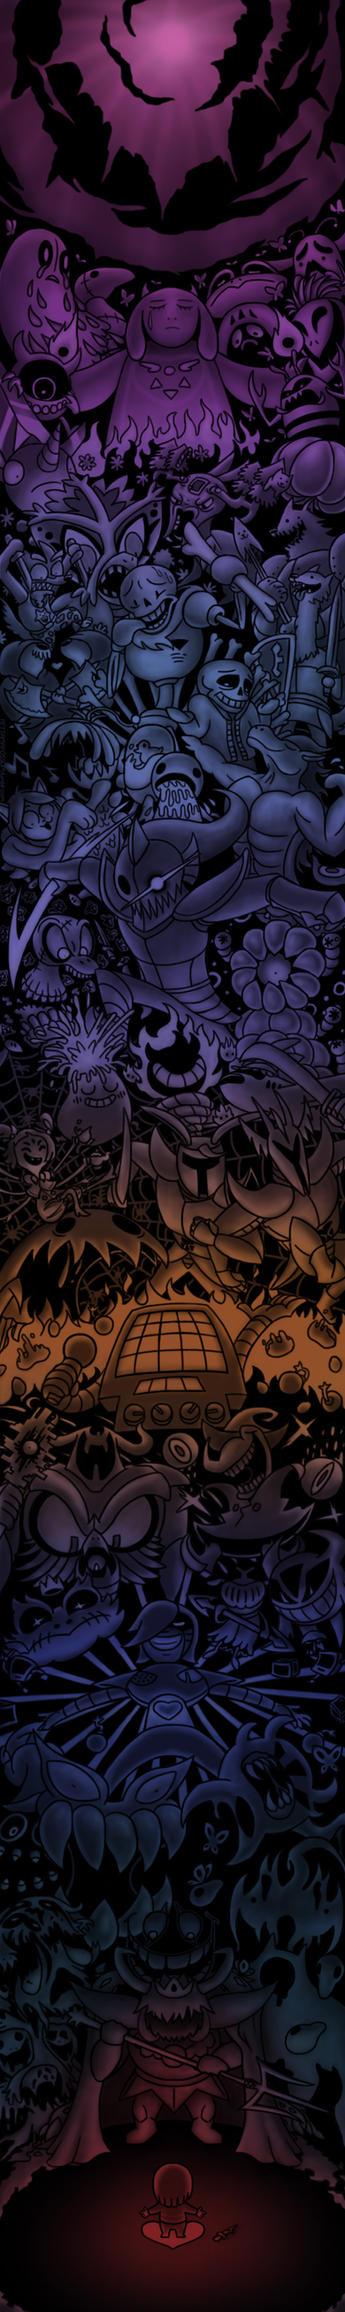 Daily #1000 - Undertale by pettamapossum